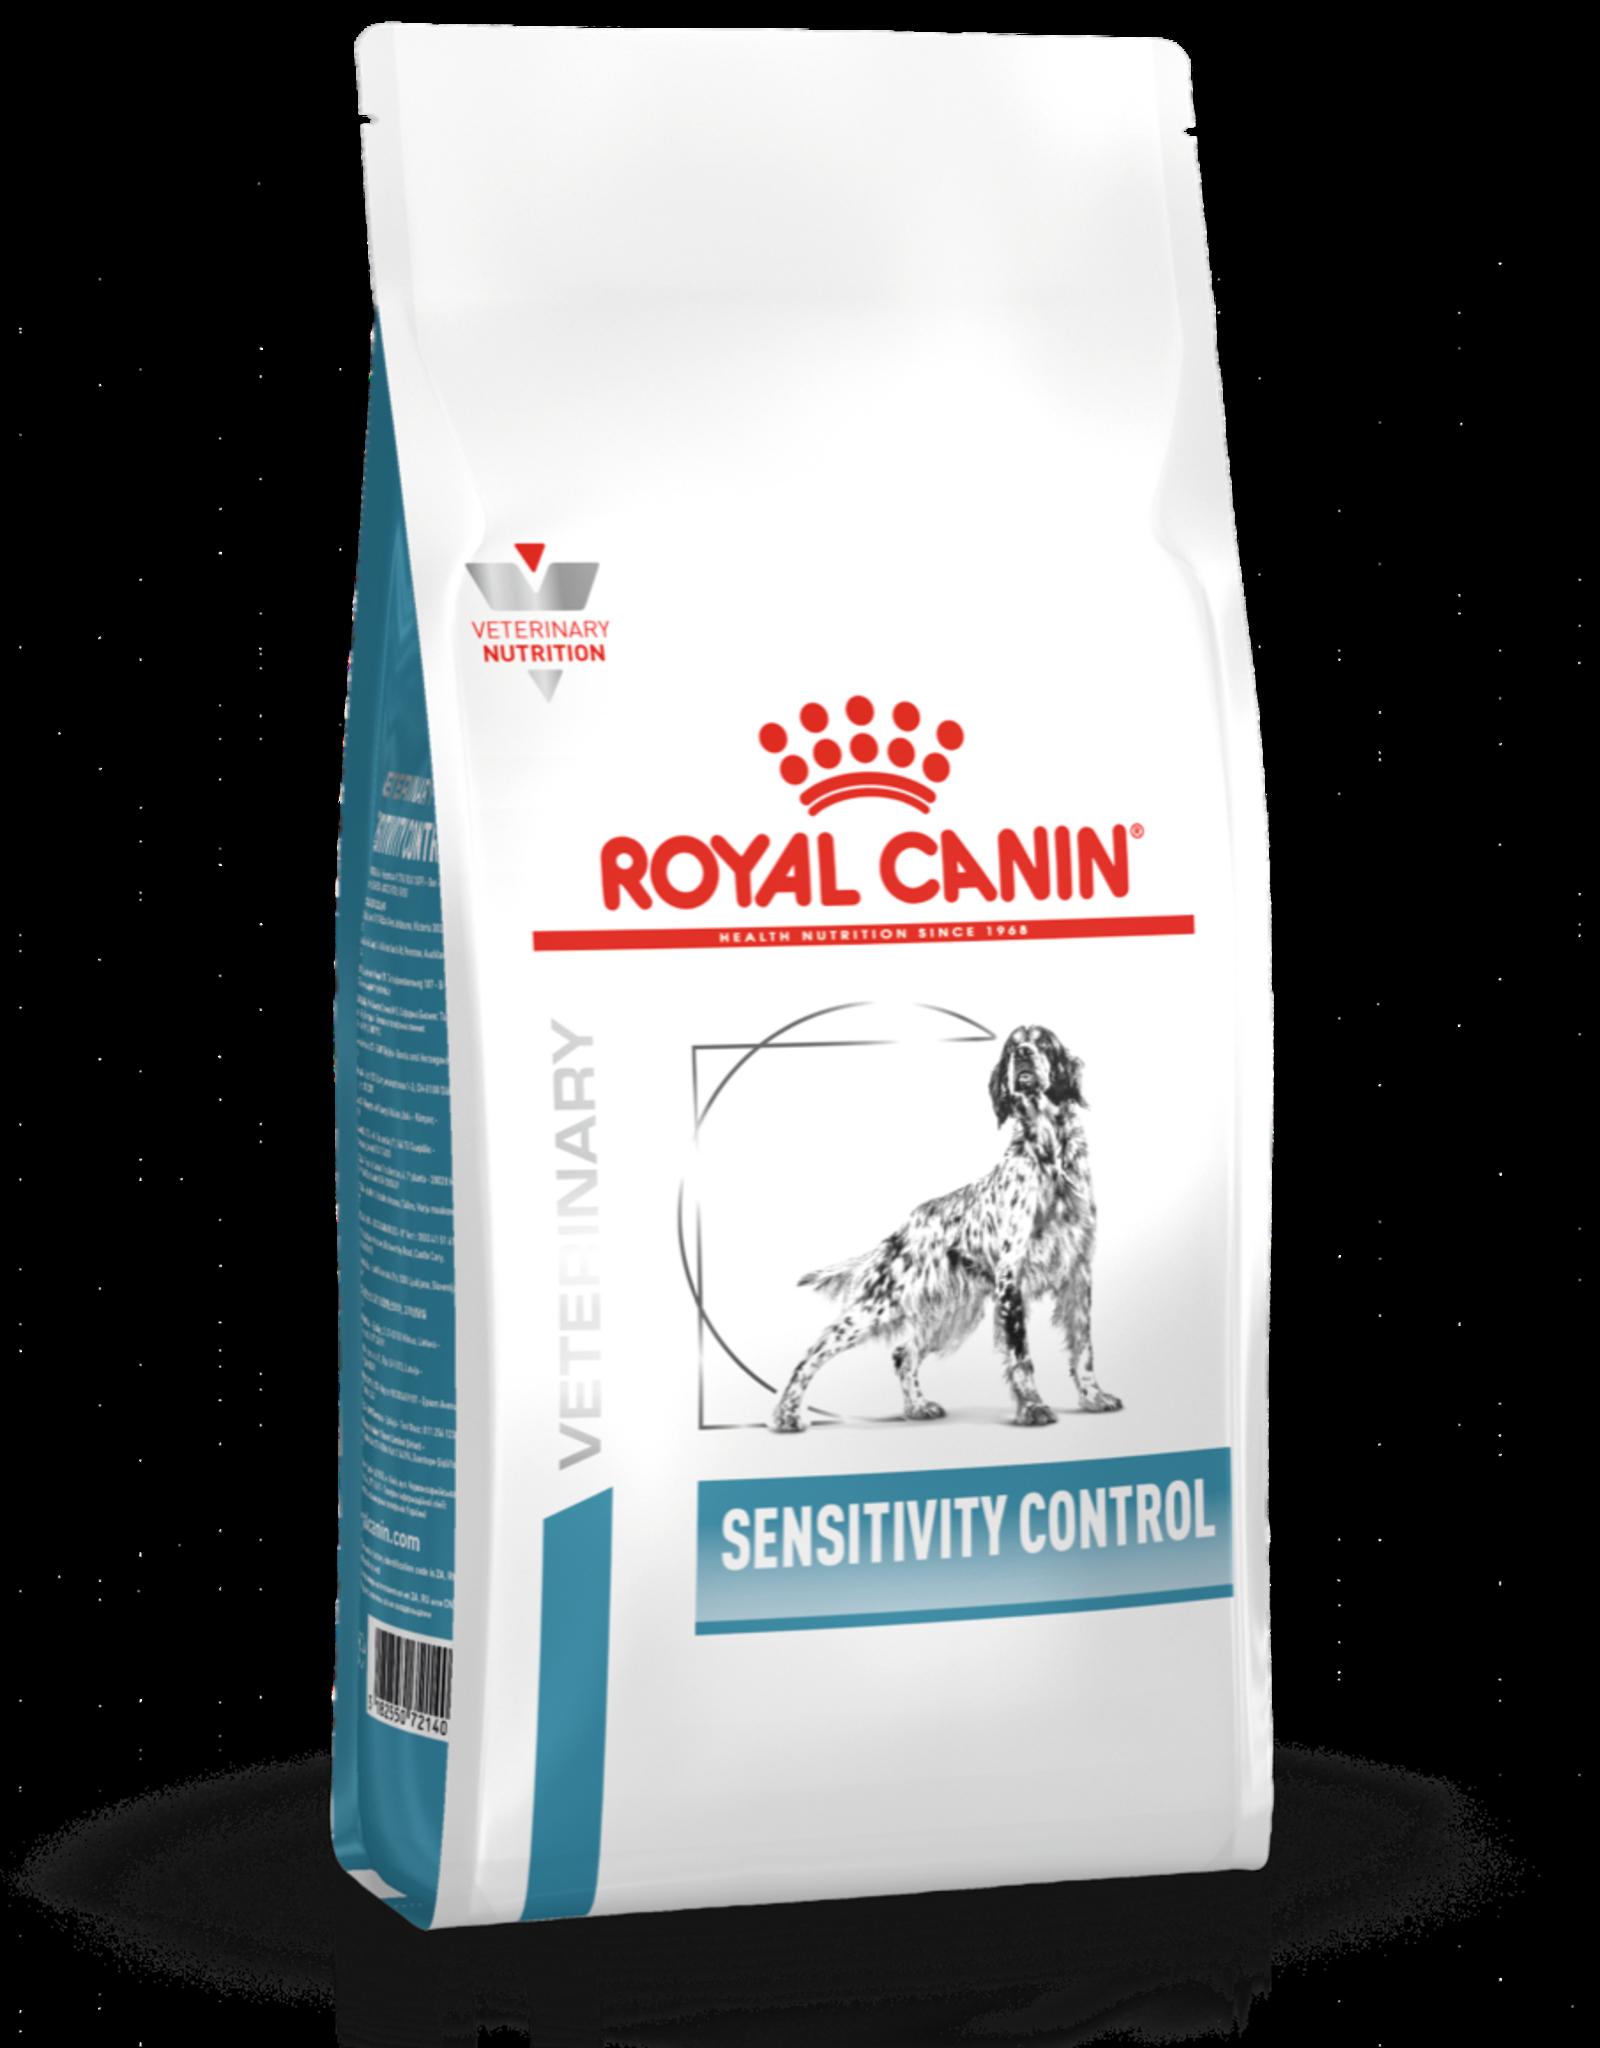 Royal Canin Royal Canin Sensitivity Control Hond Duck 14kg